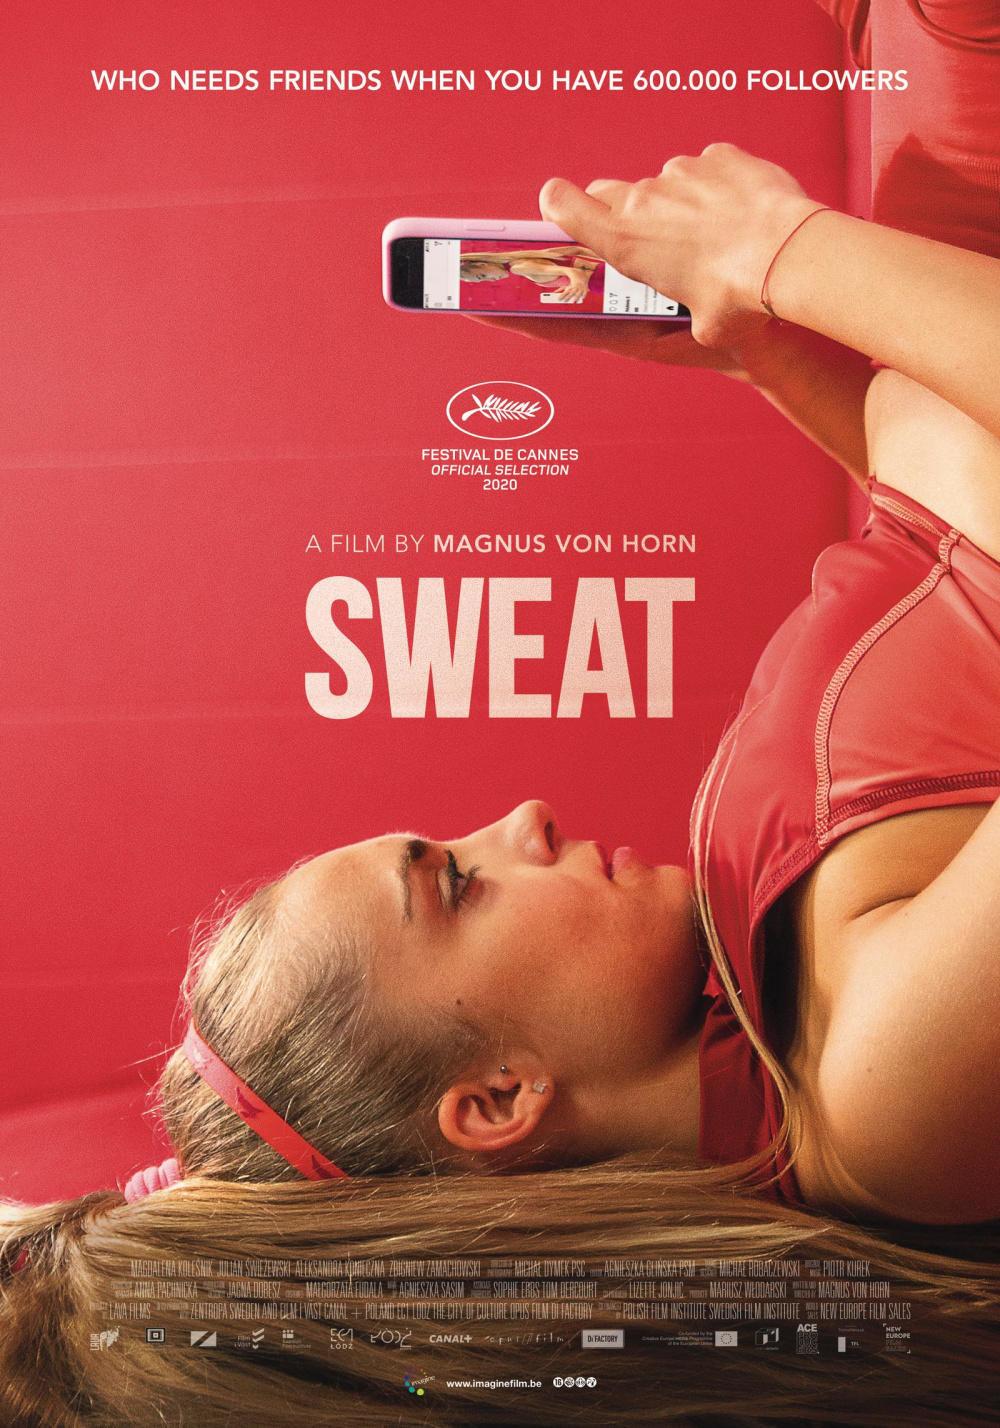 affiche du film Sweat